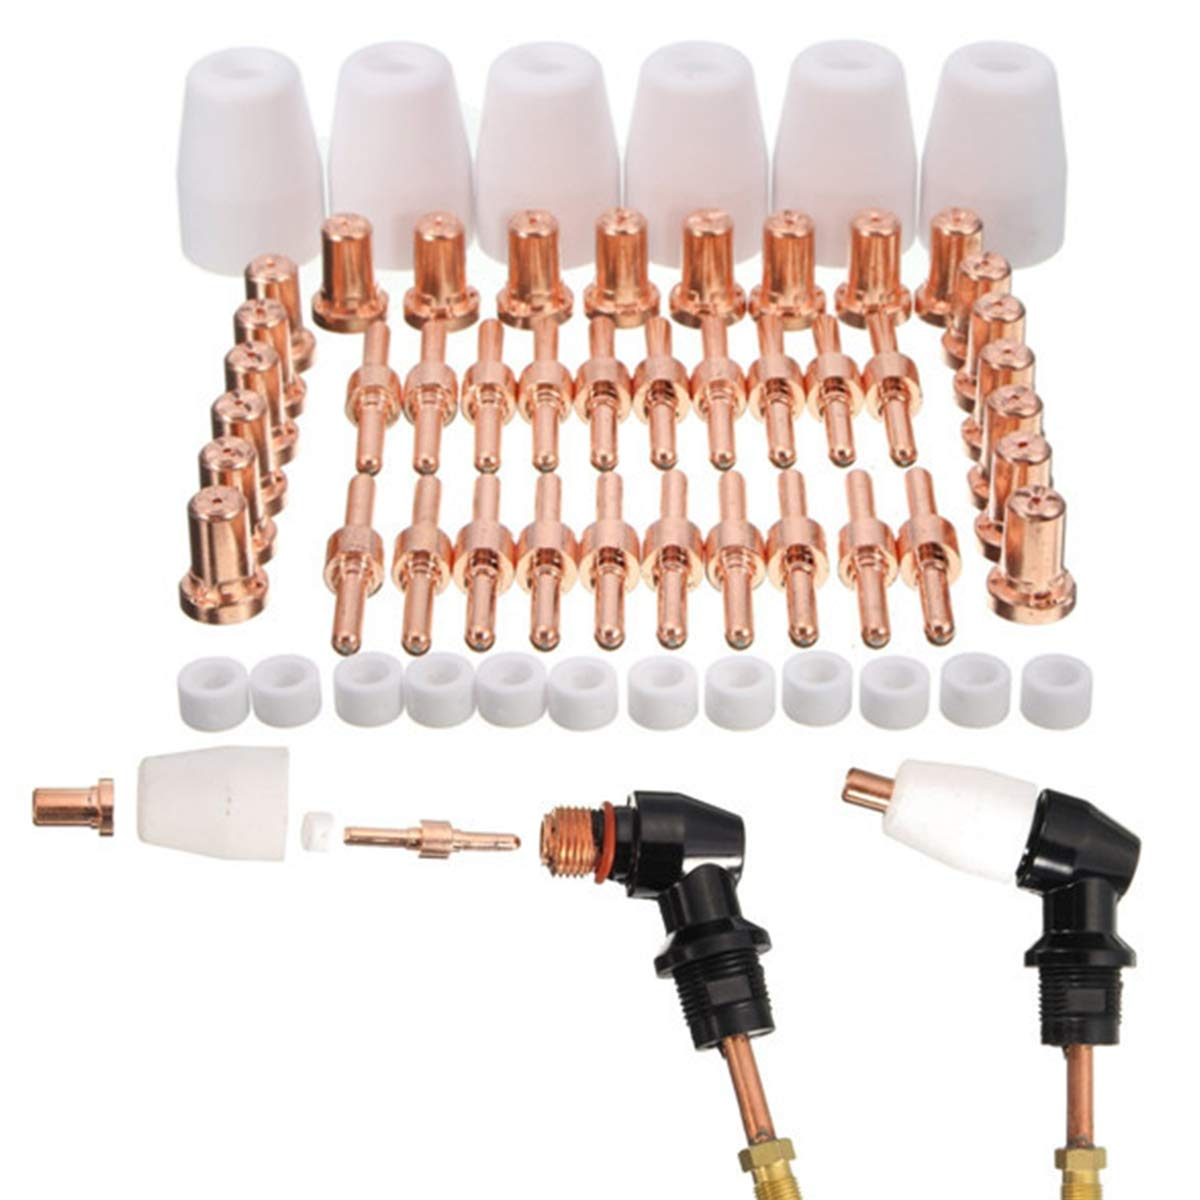 58pcs Long Tip Electrode Tip for CT520D LT5000D 50R 40R 5000D 5200DX 520D klutch plasma primeweld razorweld hypotherm hobart 27i hyl cut50c